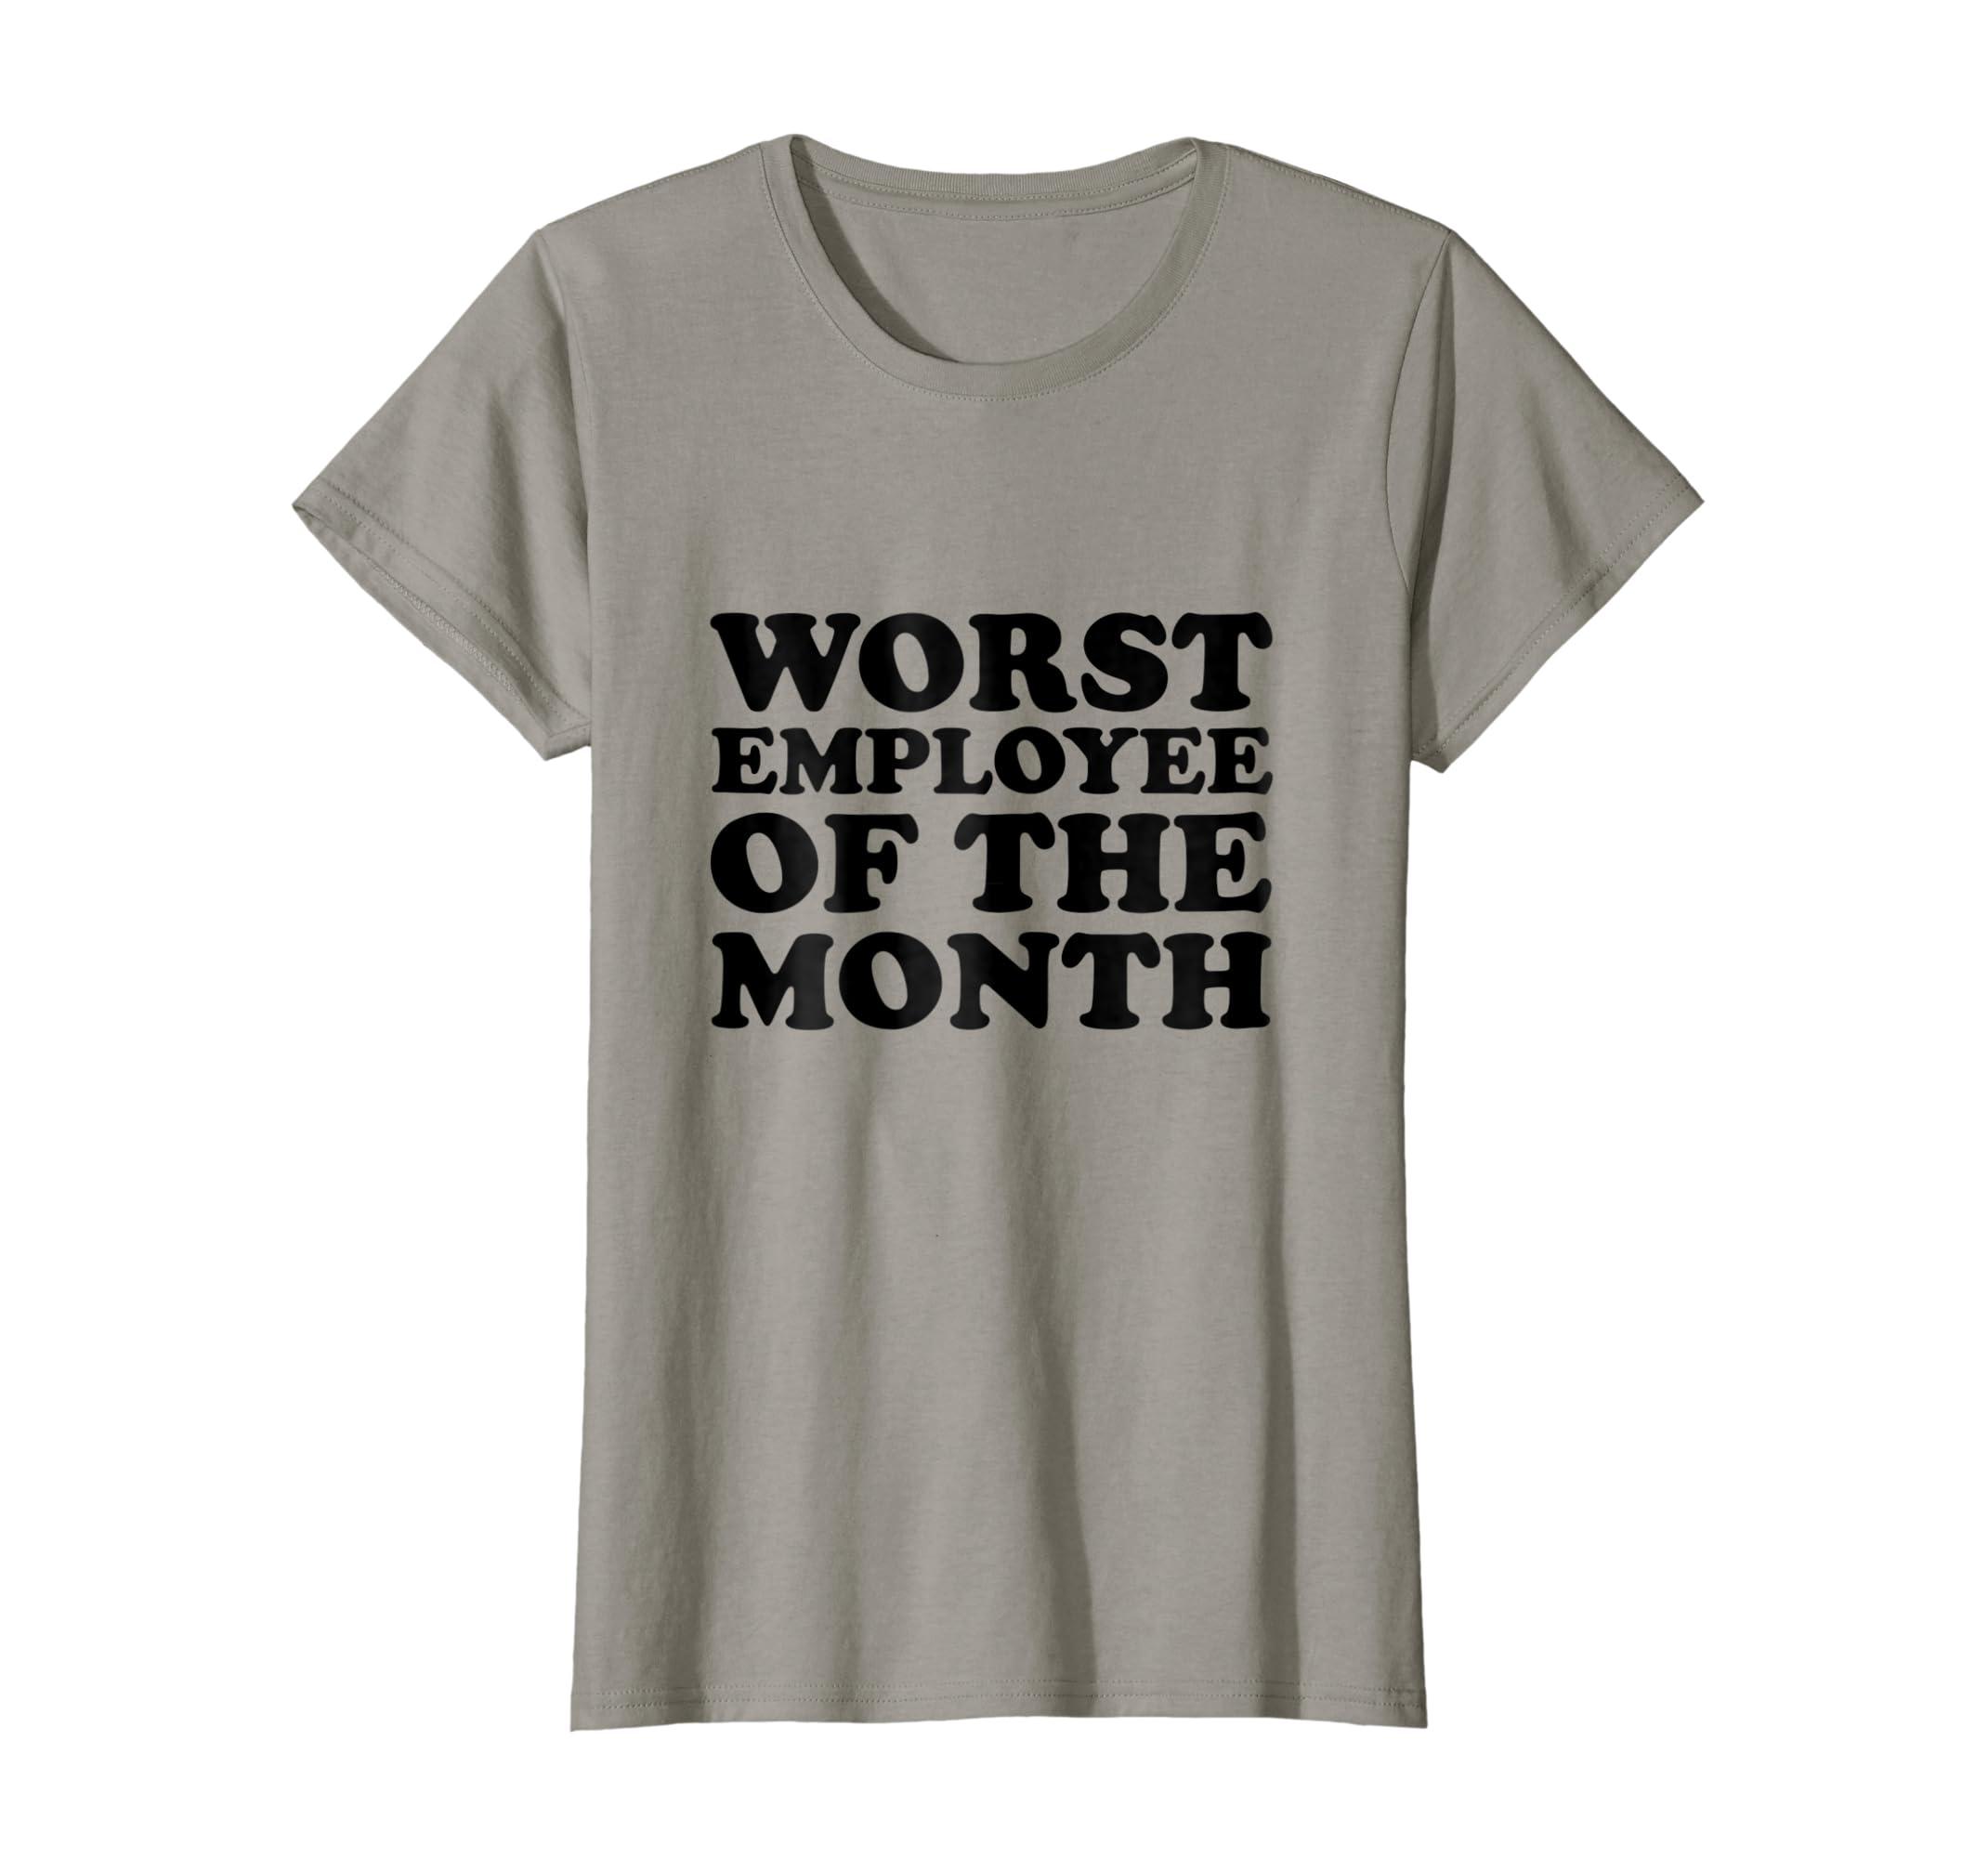 b47c5c946 Amazon.com: Worst employee of the month T-shirt Funny Humor Gift Tee:  Clothing